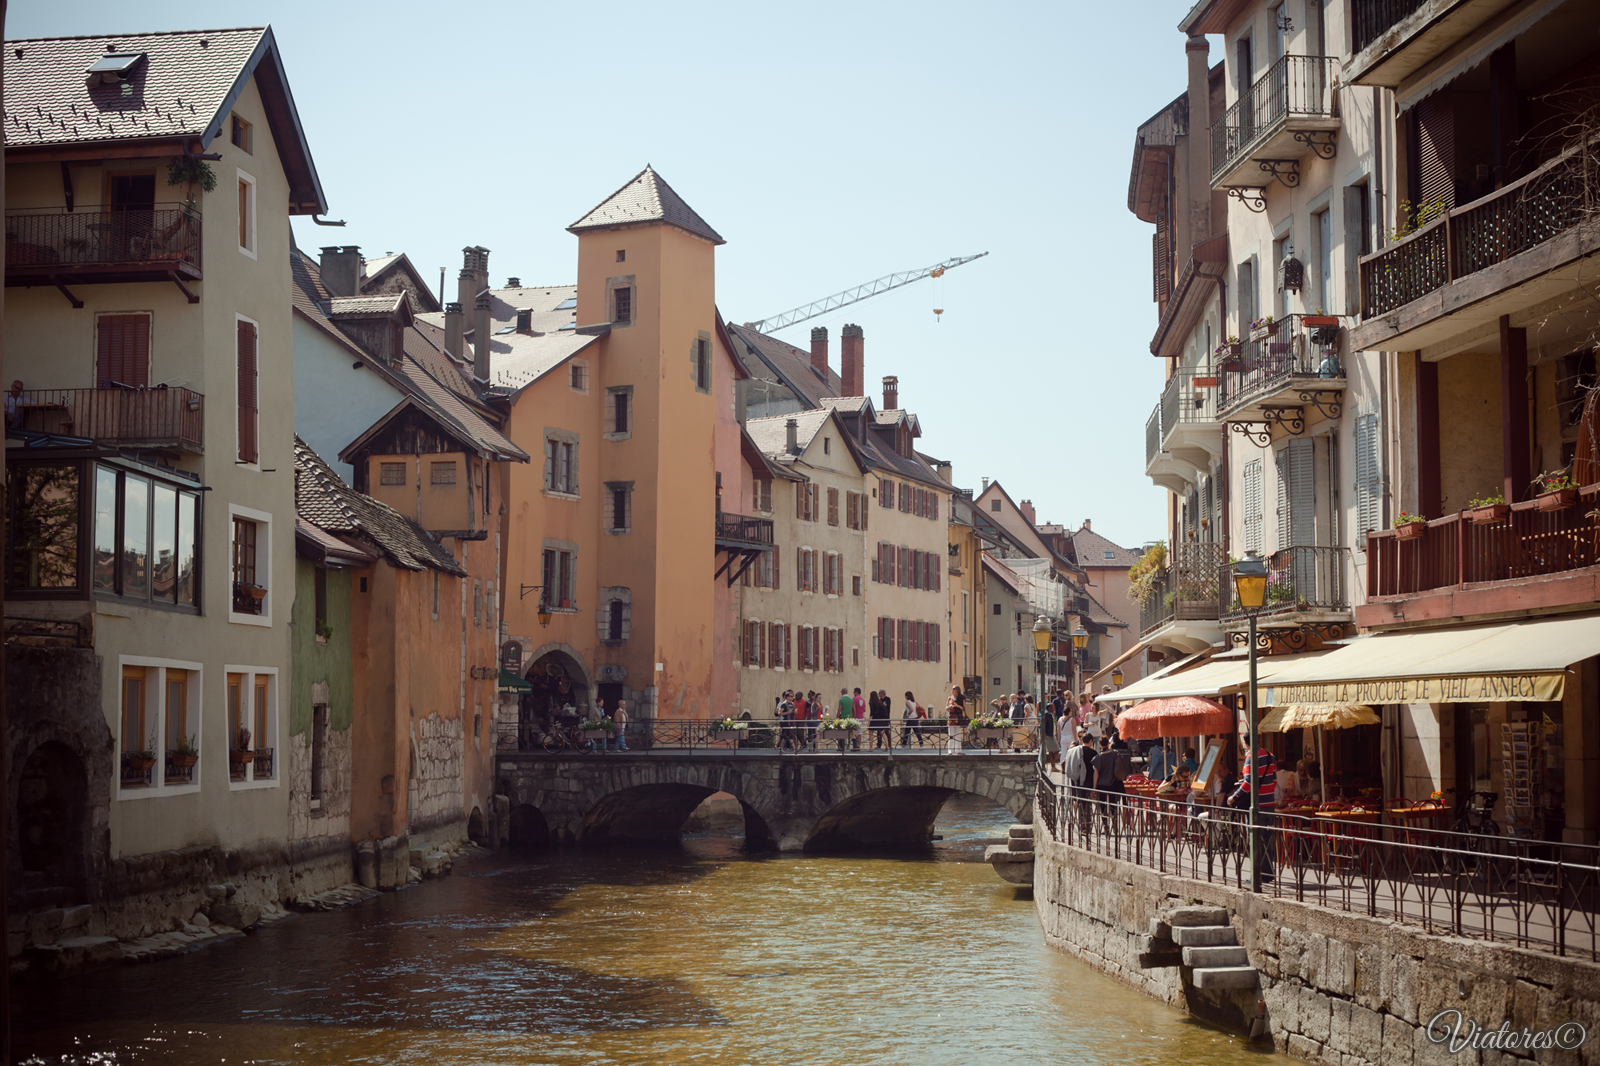 Annecy. France. Анси. Франция